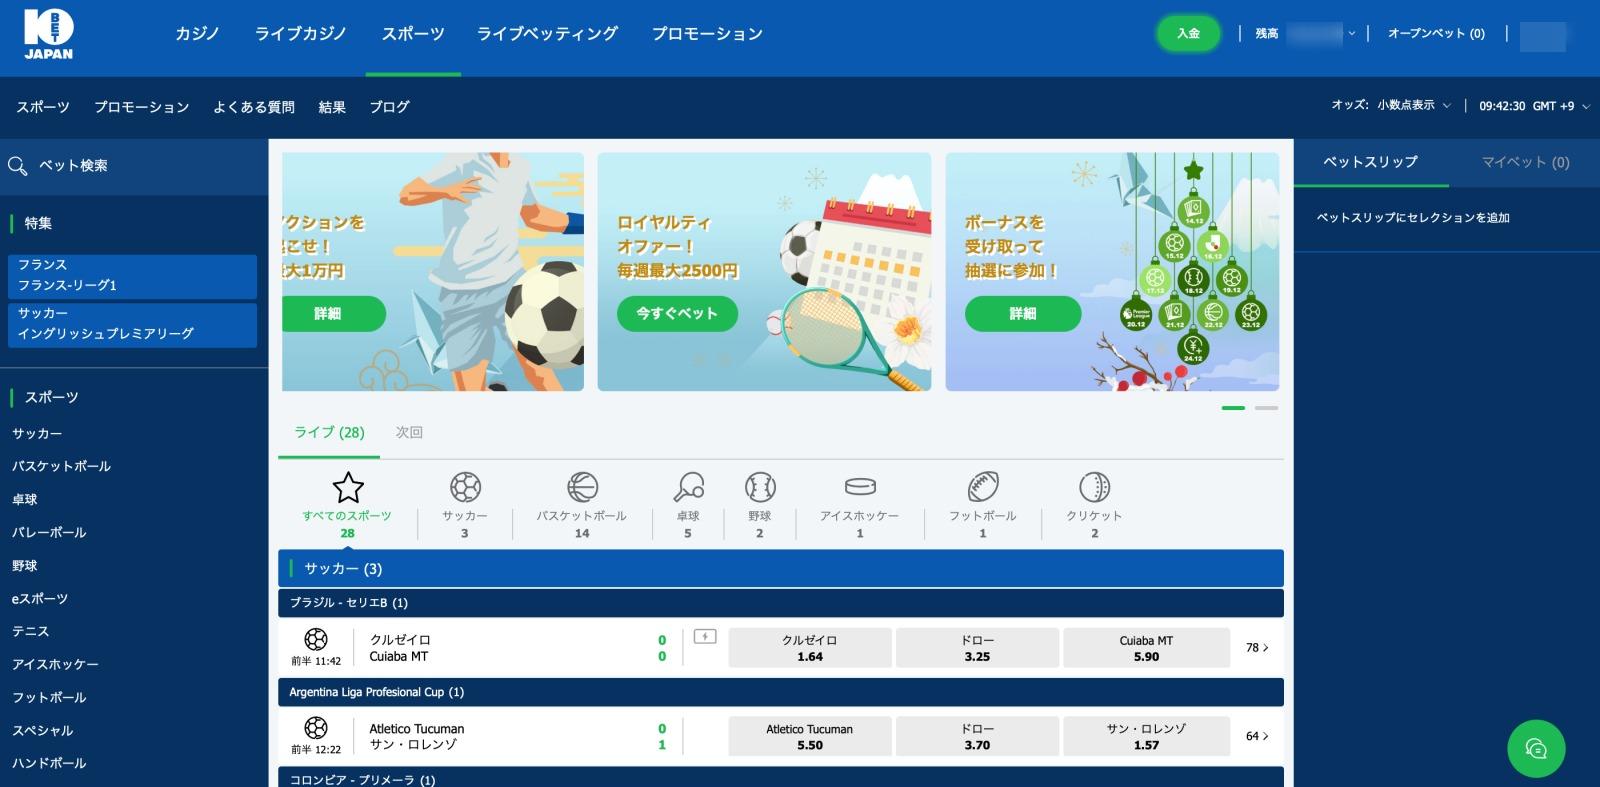 10bet Japan 日本語トップページ